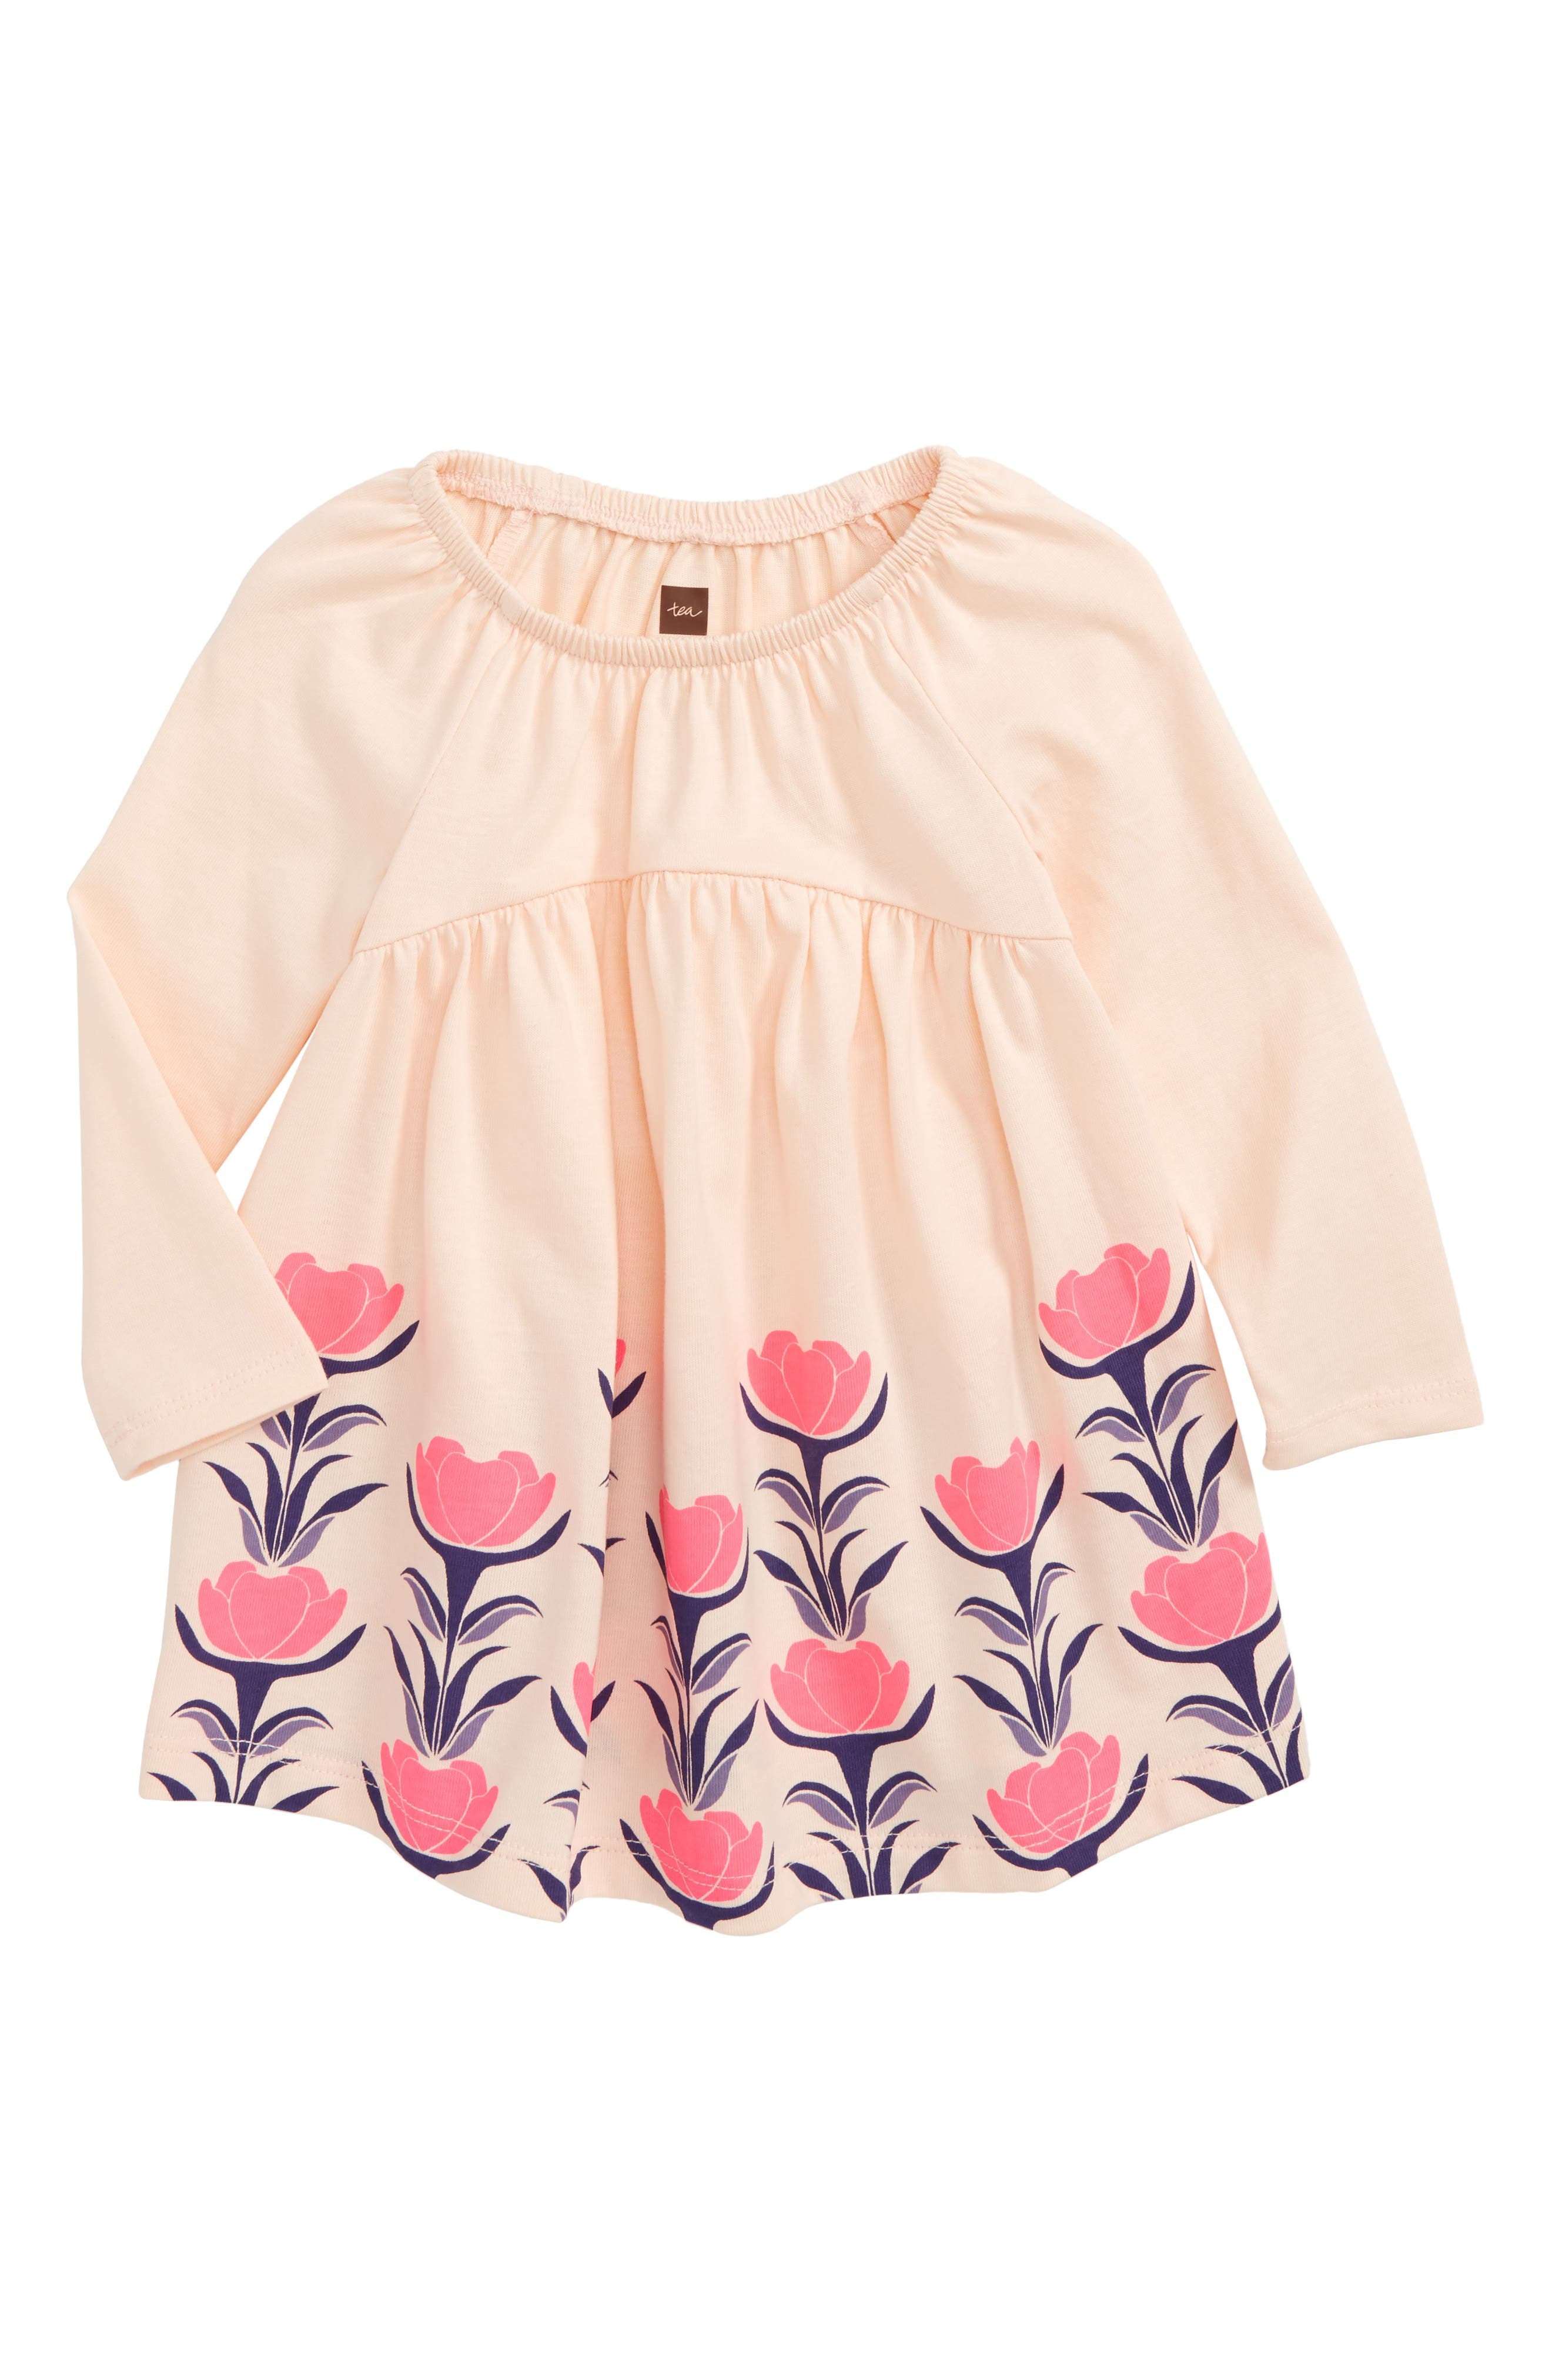 Main Image - Tea Collection Malin Dress (Baby Girls)